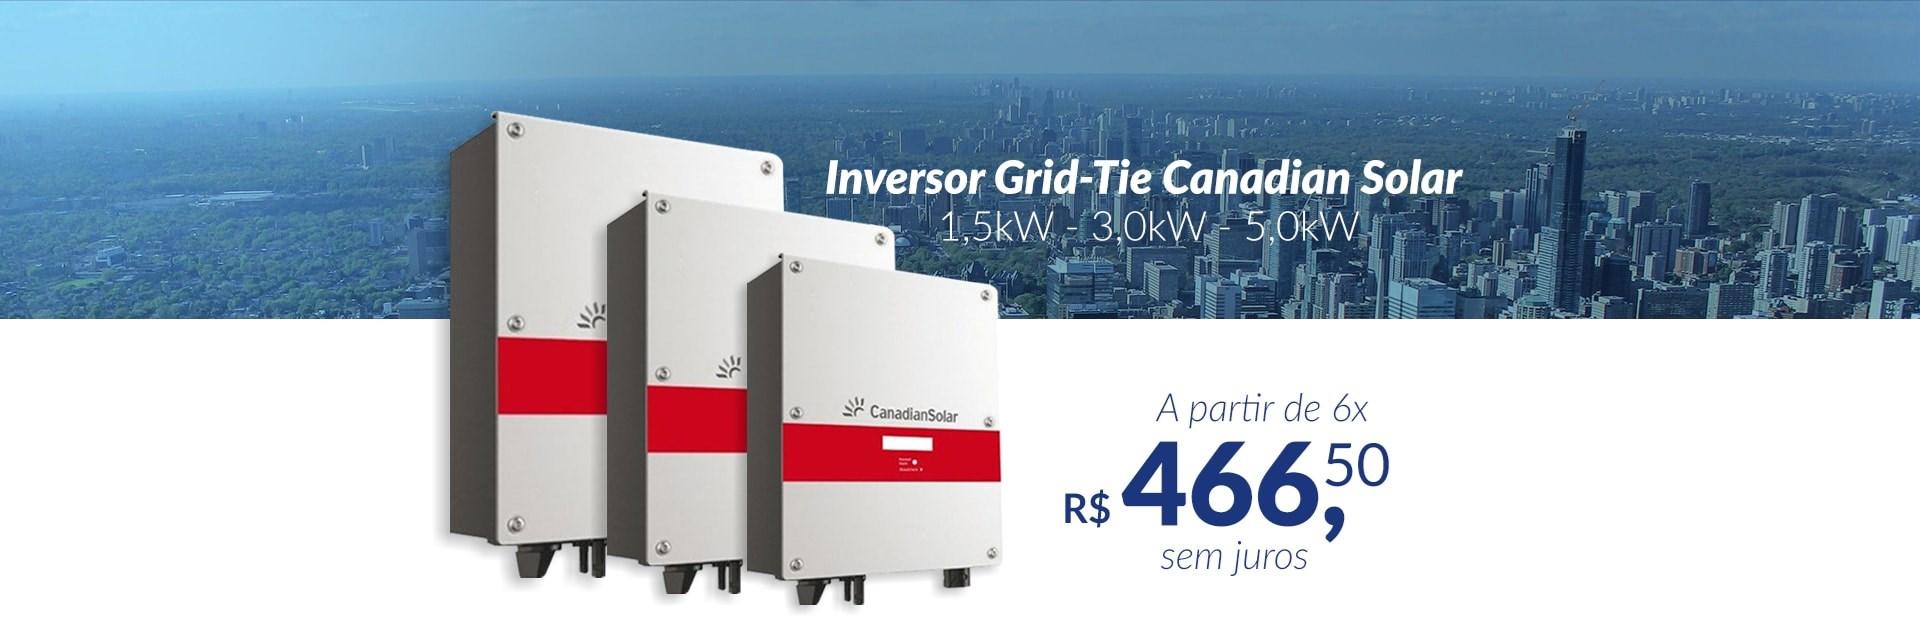 Inversor Grid-Tie Canadian Solar 1,5kW - 3,0kW - 5,0kW